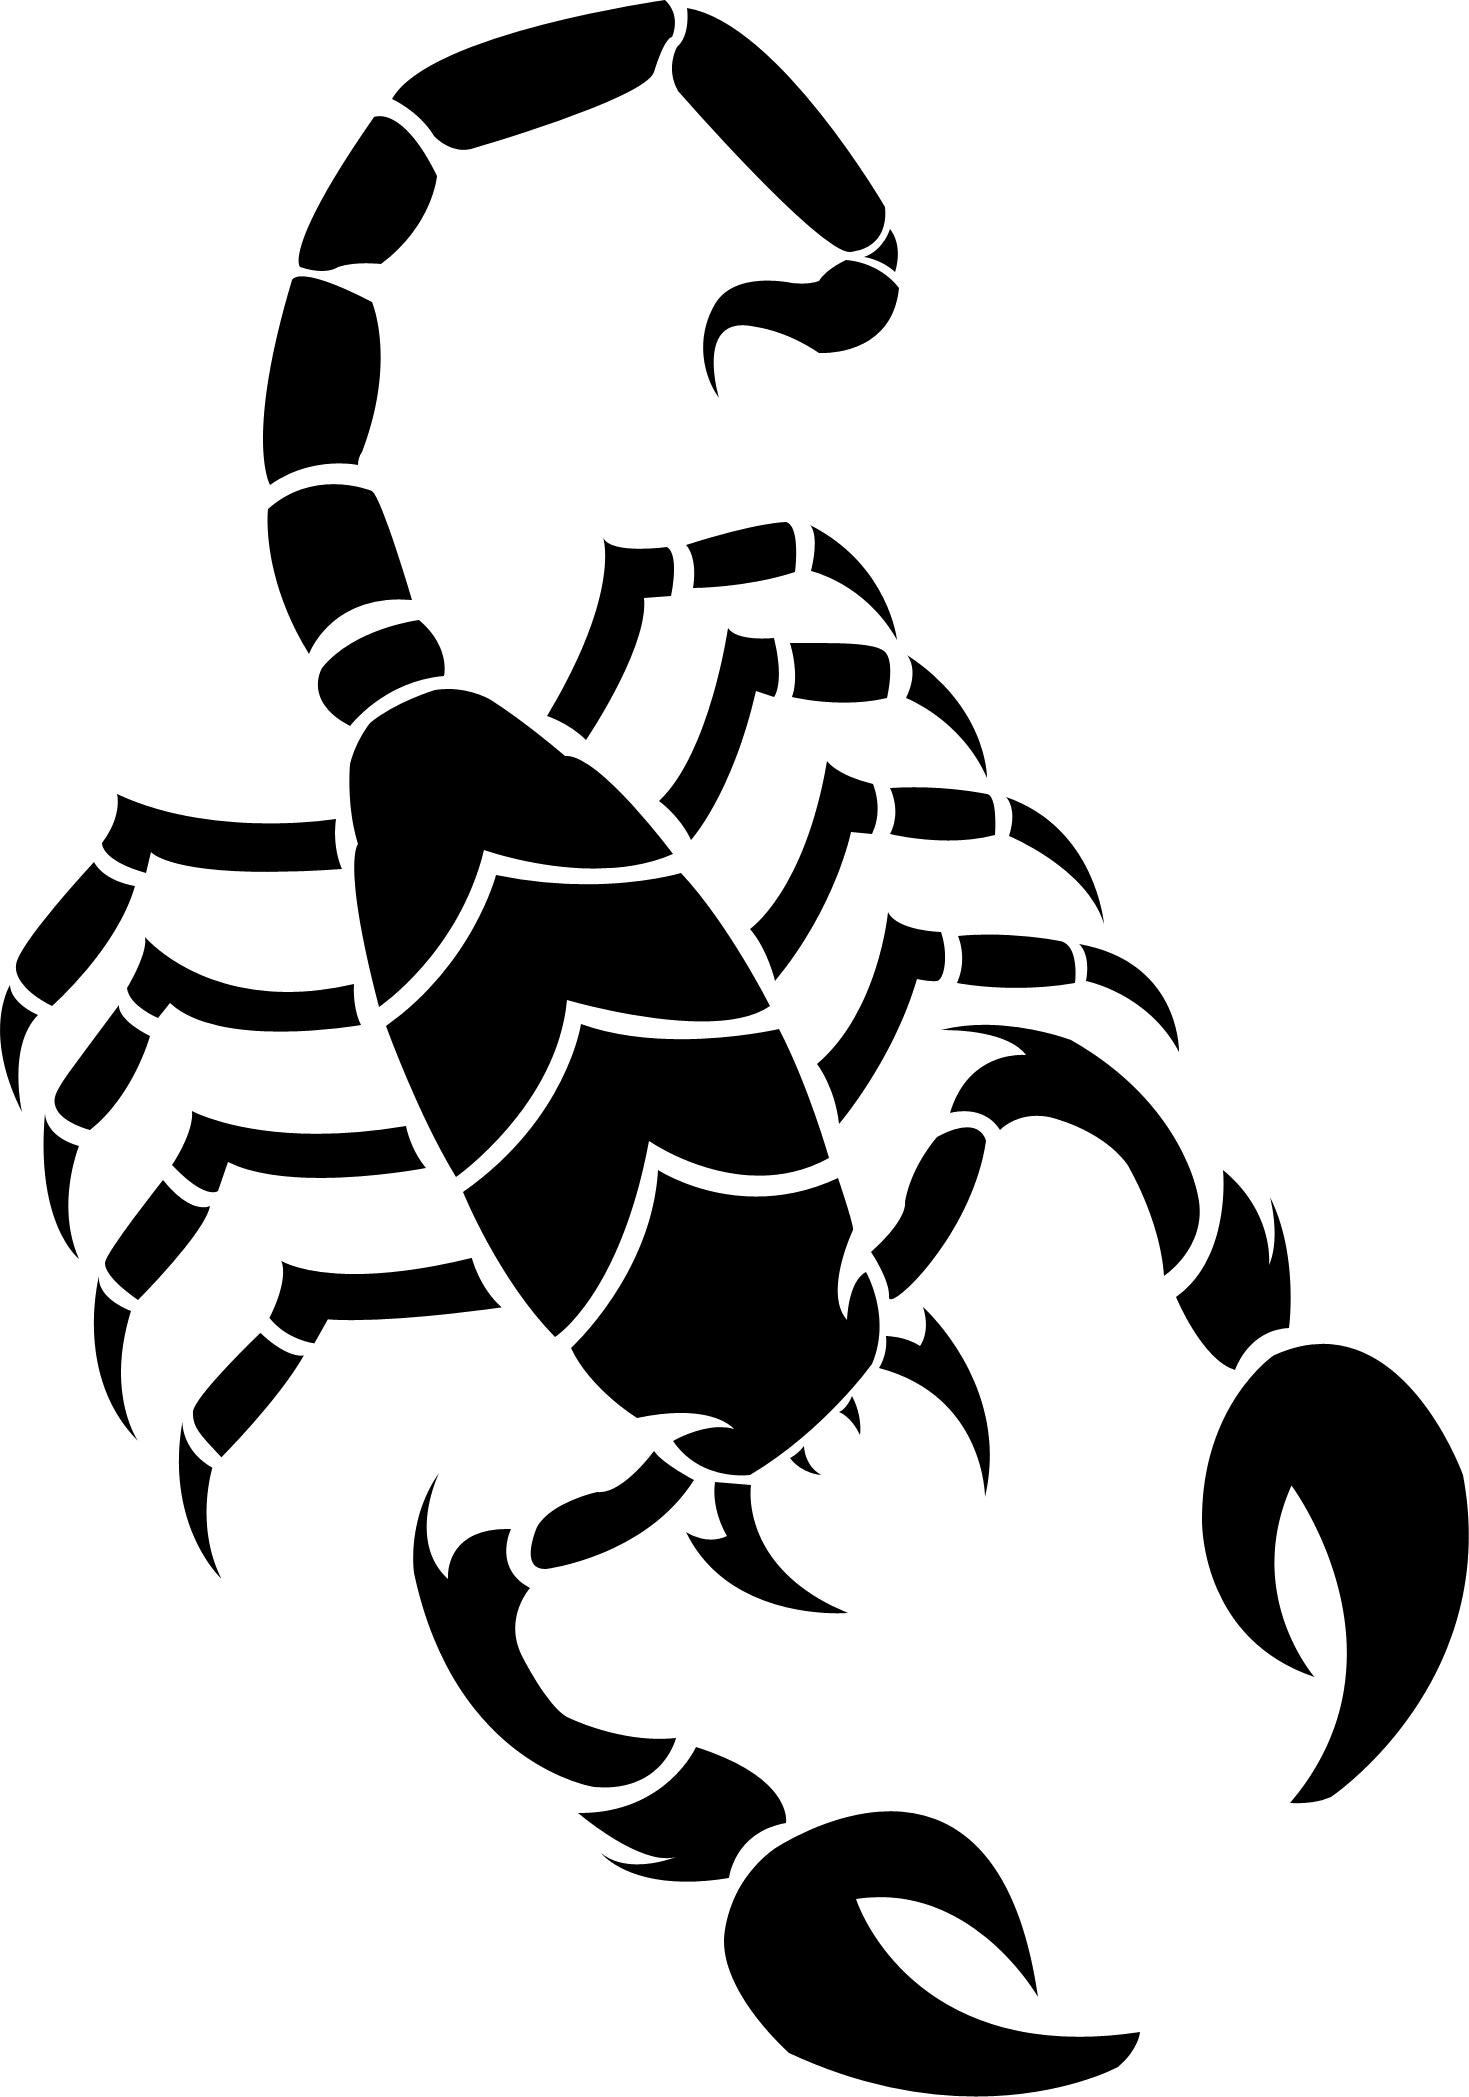 Scorpion clipart transparent #4